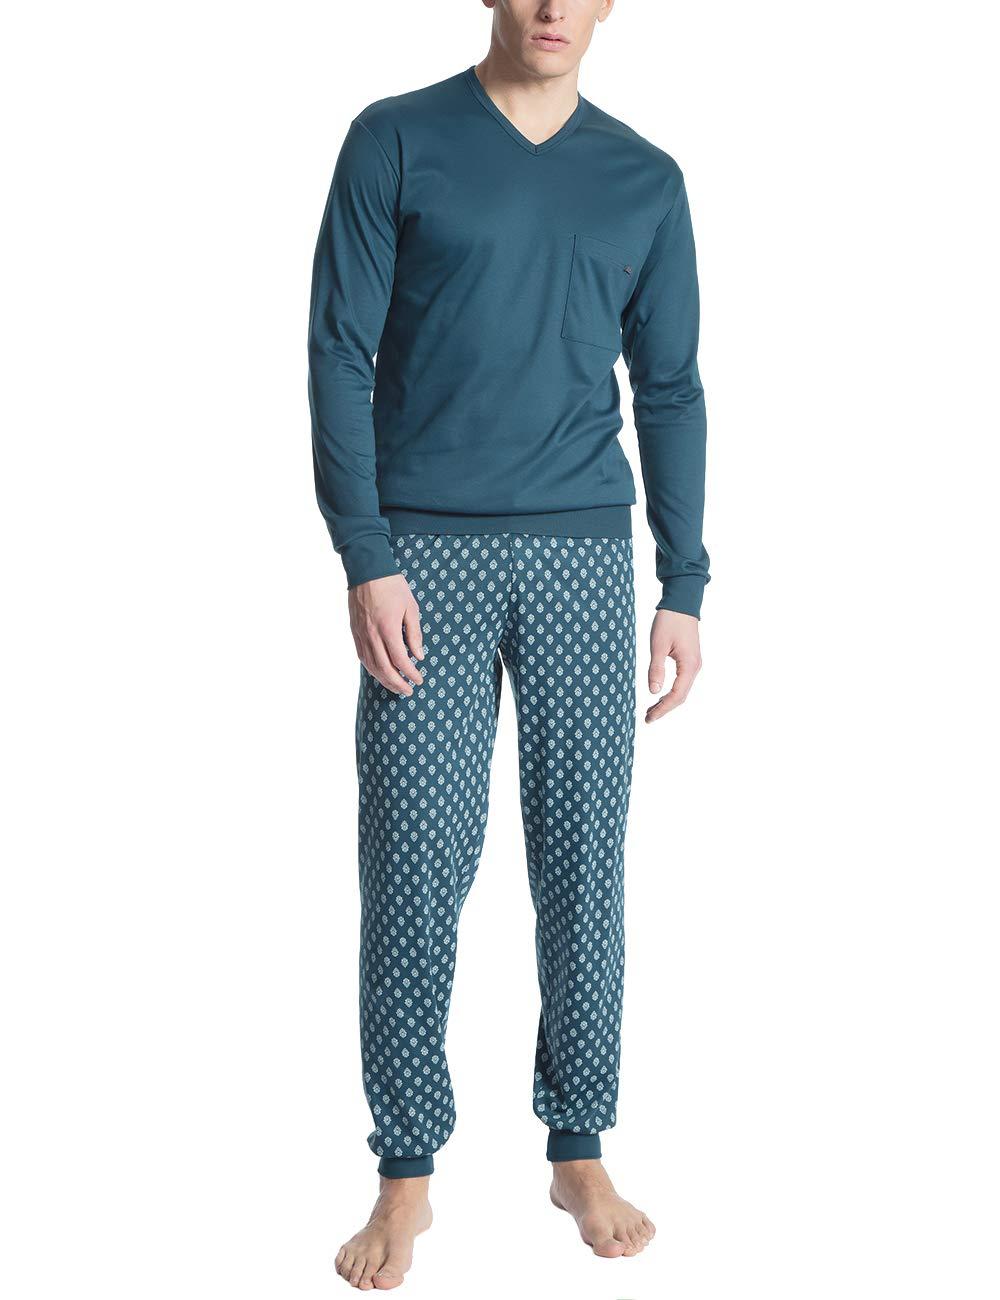 Calida De Teal 517X large Ensemble Homme PyjamaBleublue 1 Relax Wing Streamline 0m8wNnv